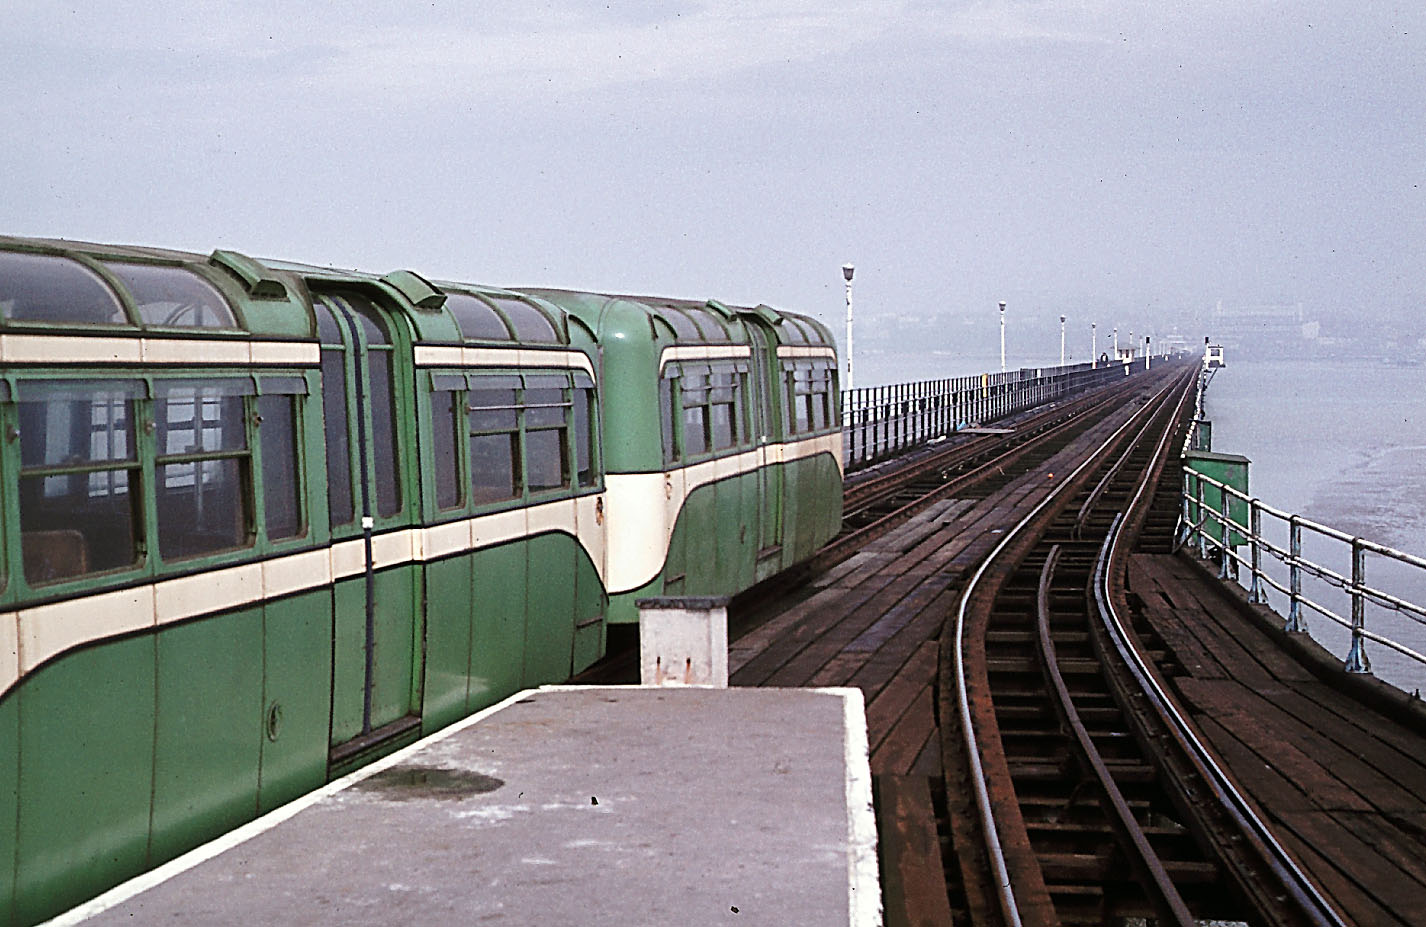 SouthendGreenTrainService2 - The Southend Pier railway